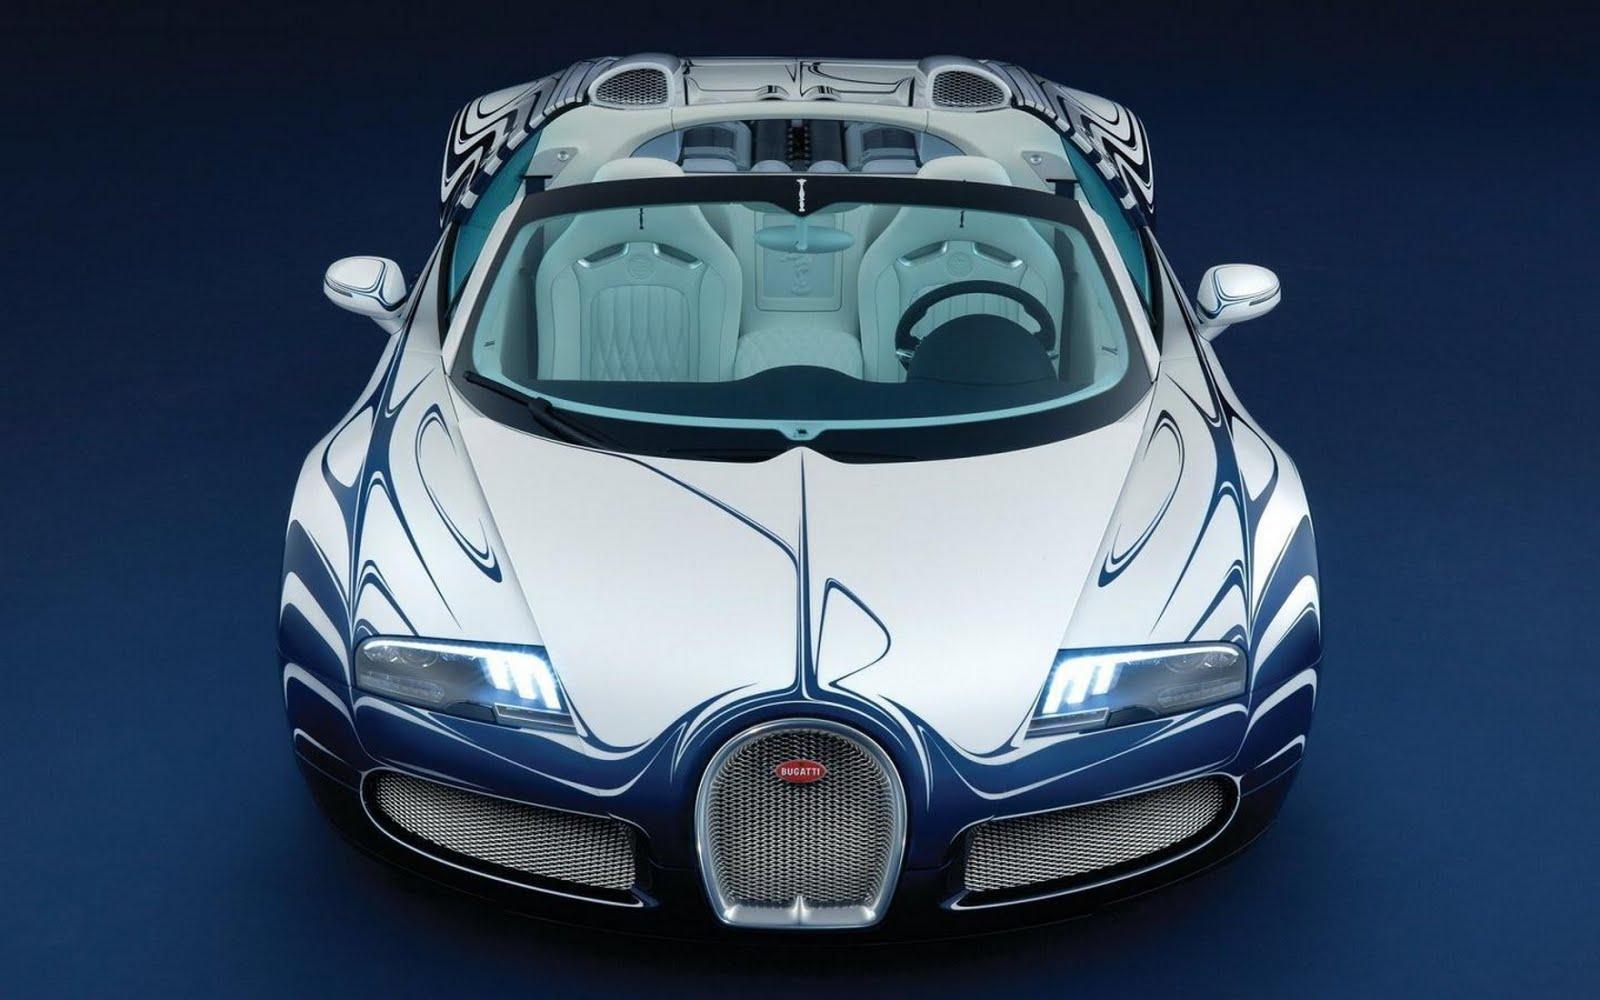 godtoldmetonoise bugatti veyron grand sport l 39 or blanc. Black Bedroom Furniture Sets. Home Design Ideas